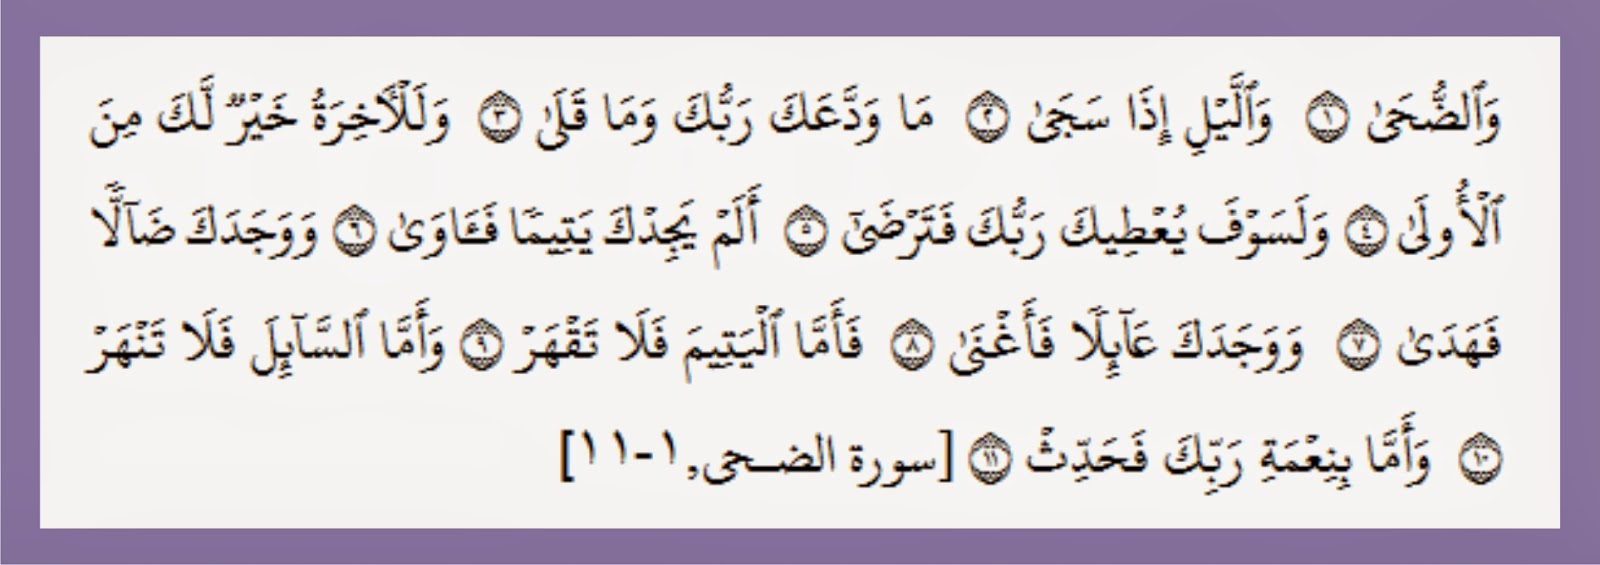 Bacaan Surah Ad Duha dan Arinya